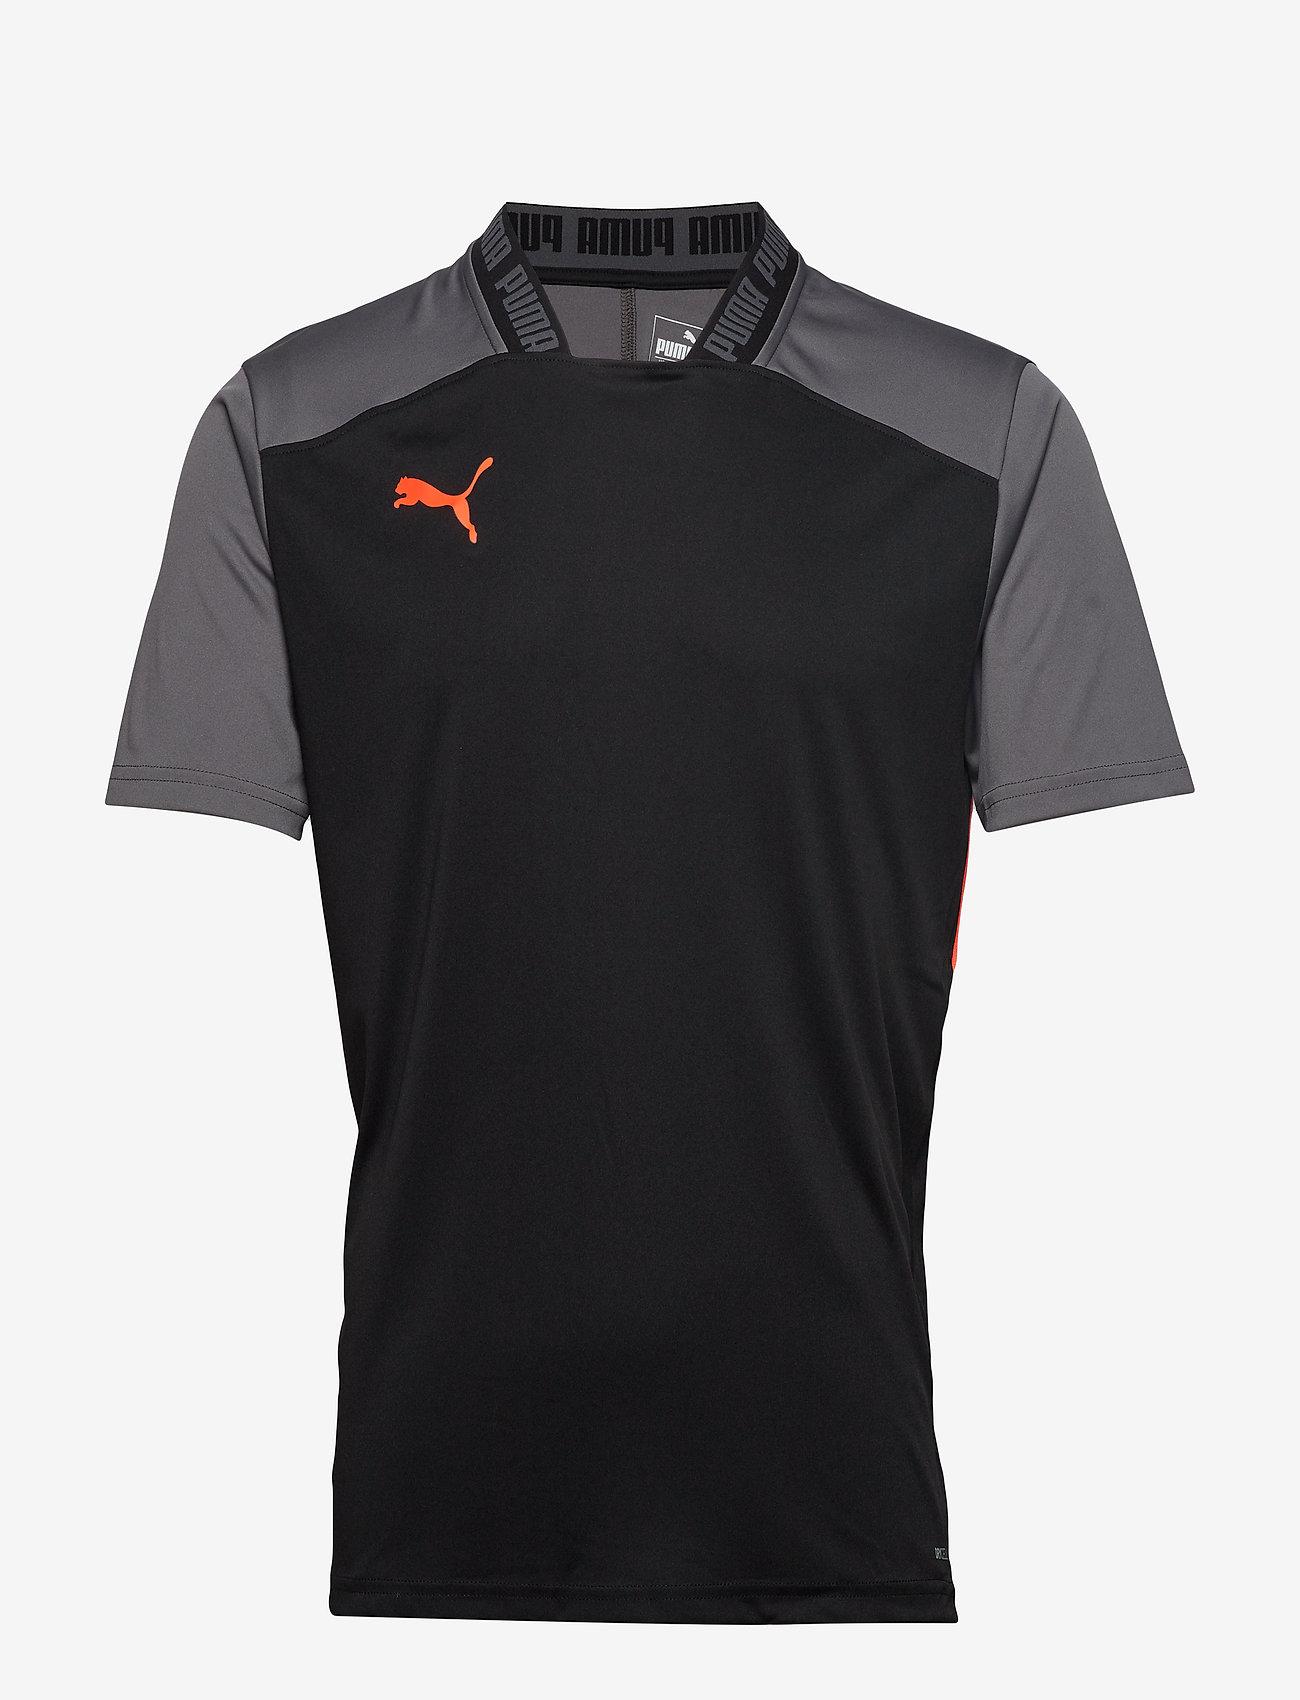 PUMA - ftblNXT Pro Tee - football shirts - puma black-nrgy red - 0